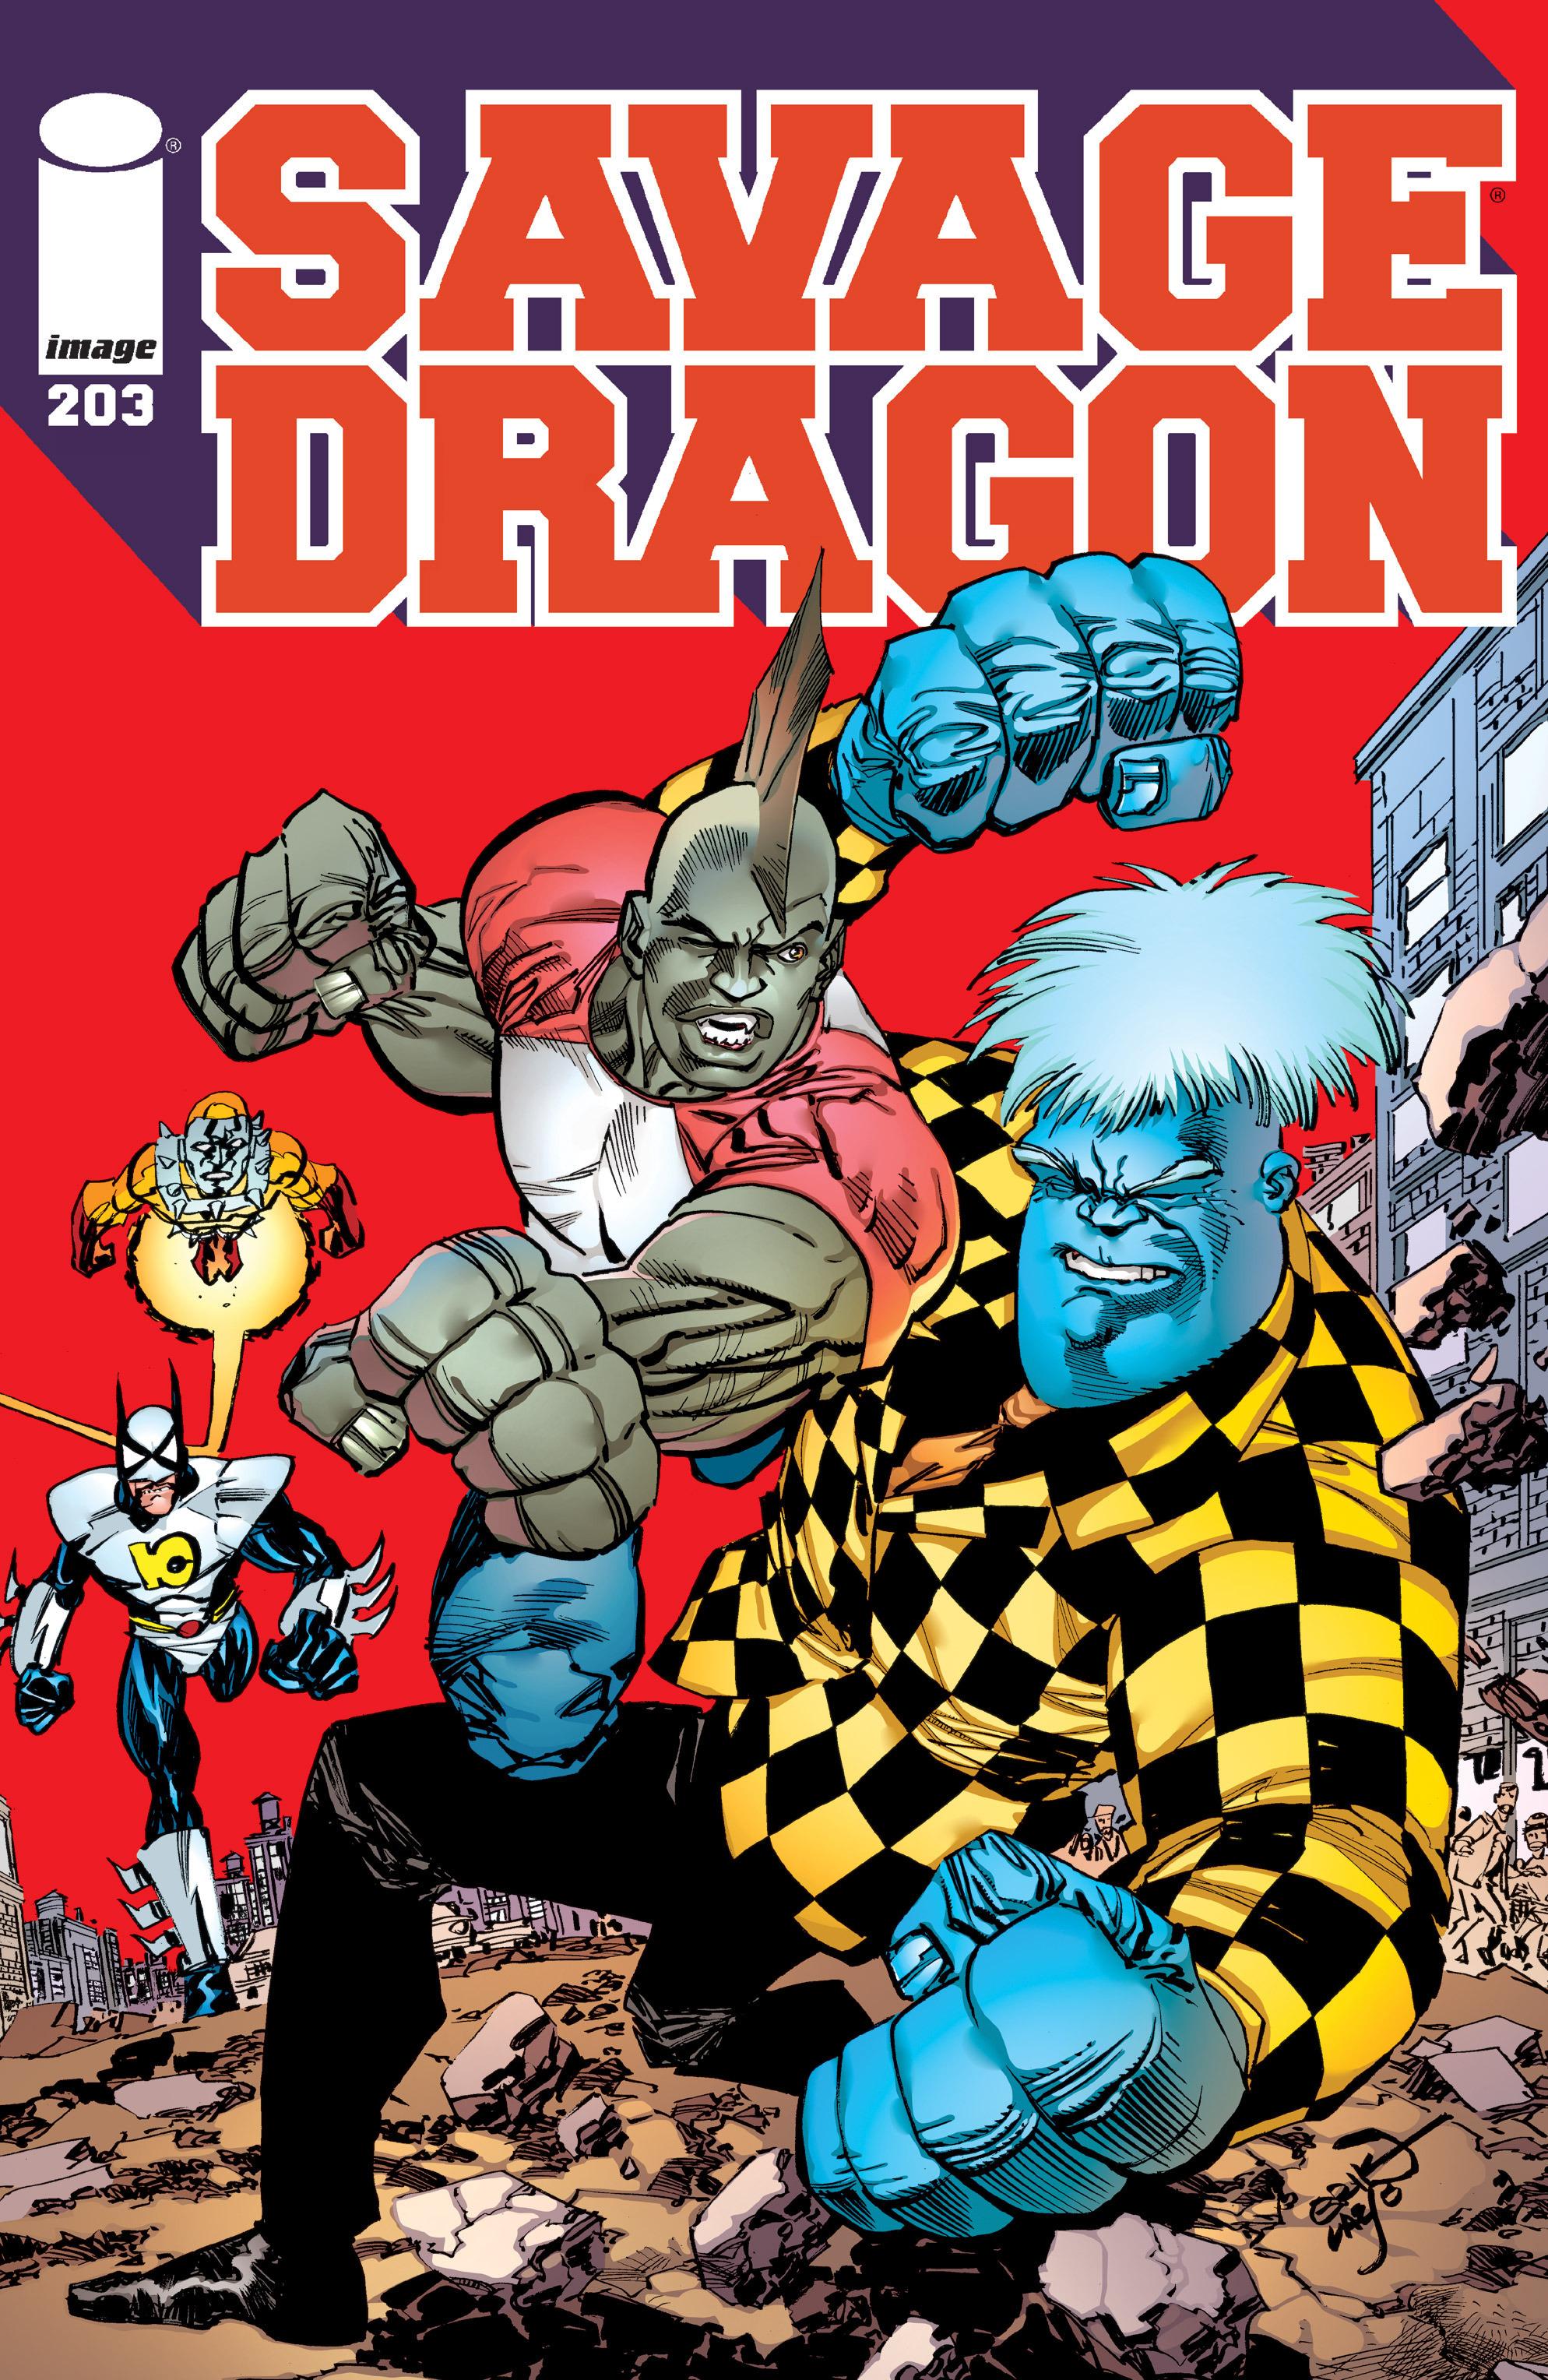 Cover Savage Dragon Vol.2 #203